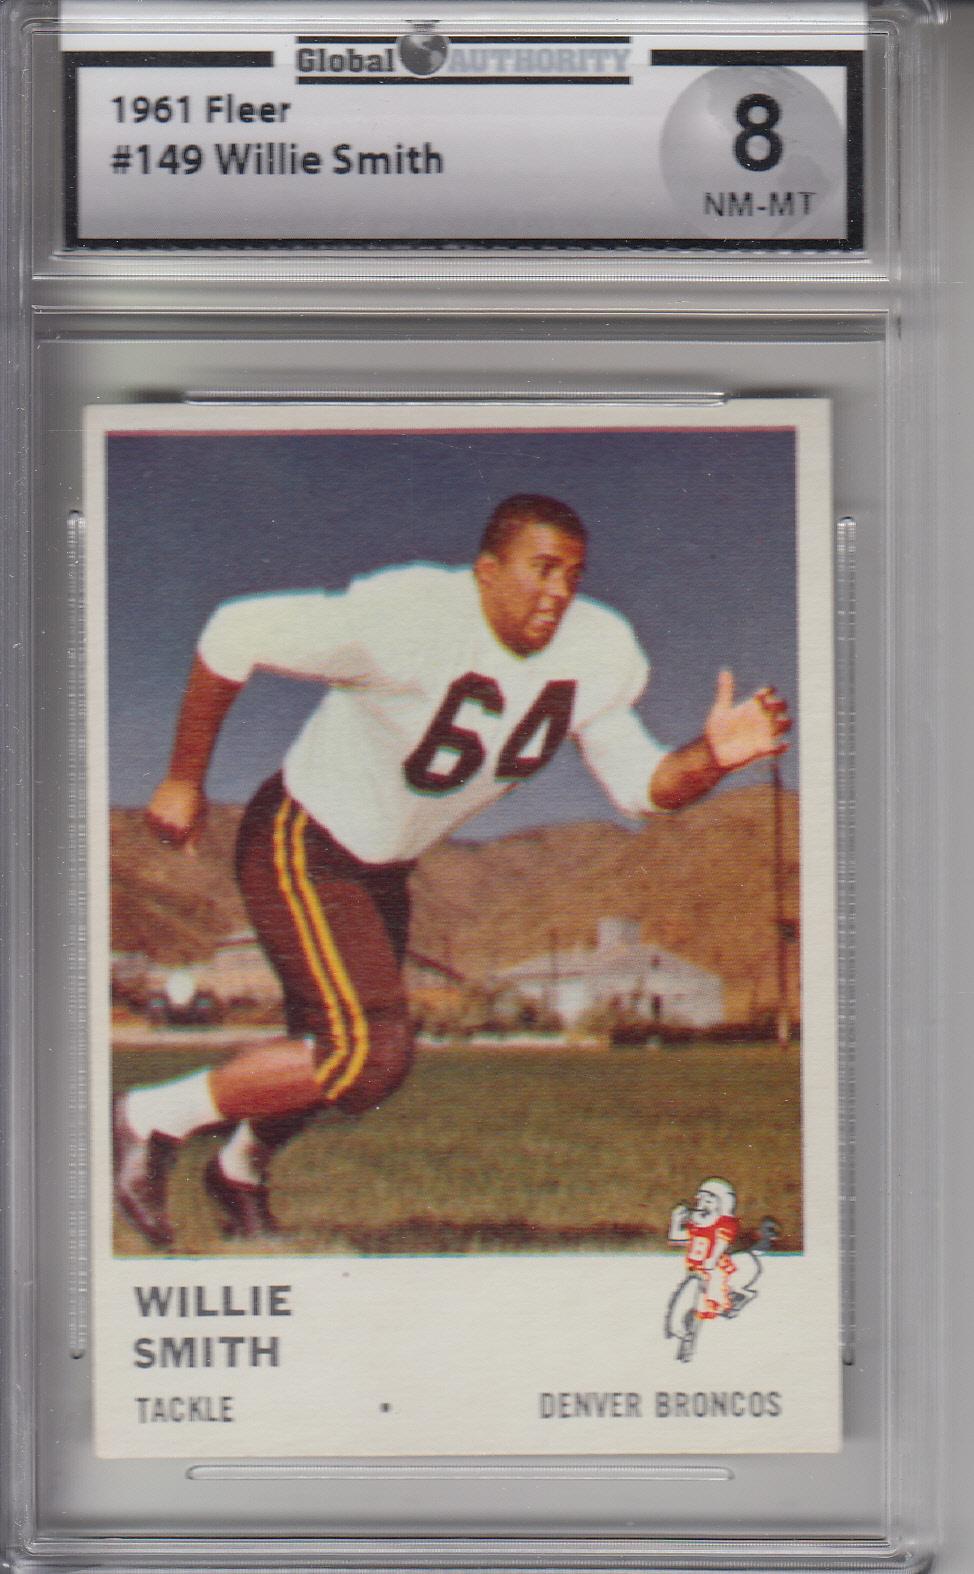 1961 Fleer #149 Willie Smith BRONCOS GAI 8 NM-MT Z20318